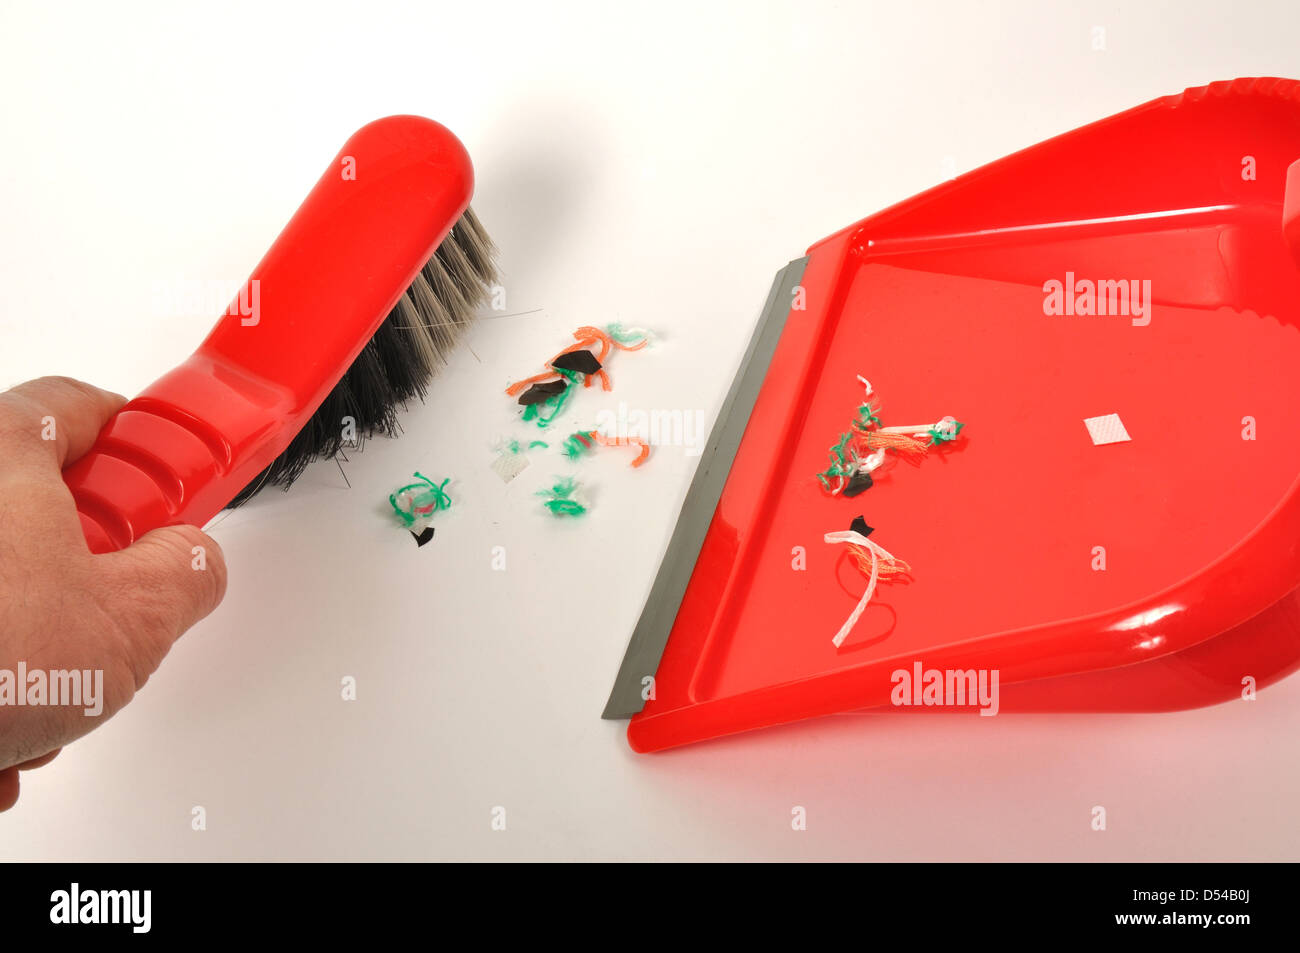 Dustpan and Brush - Stock Image